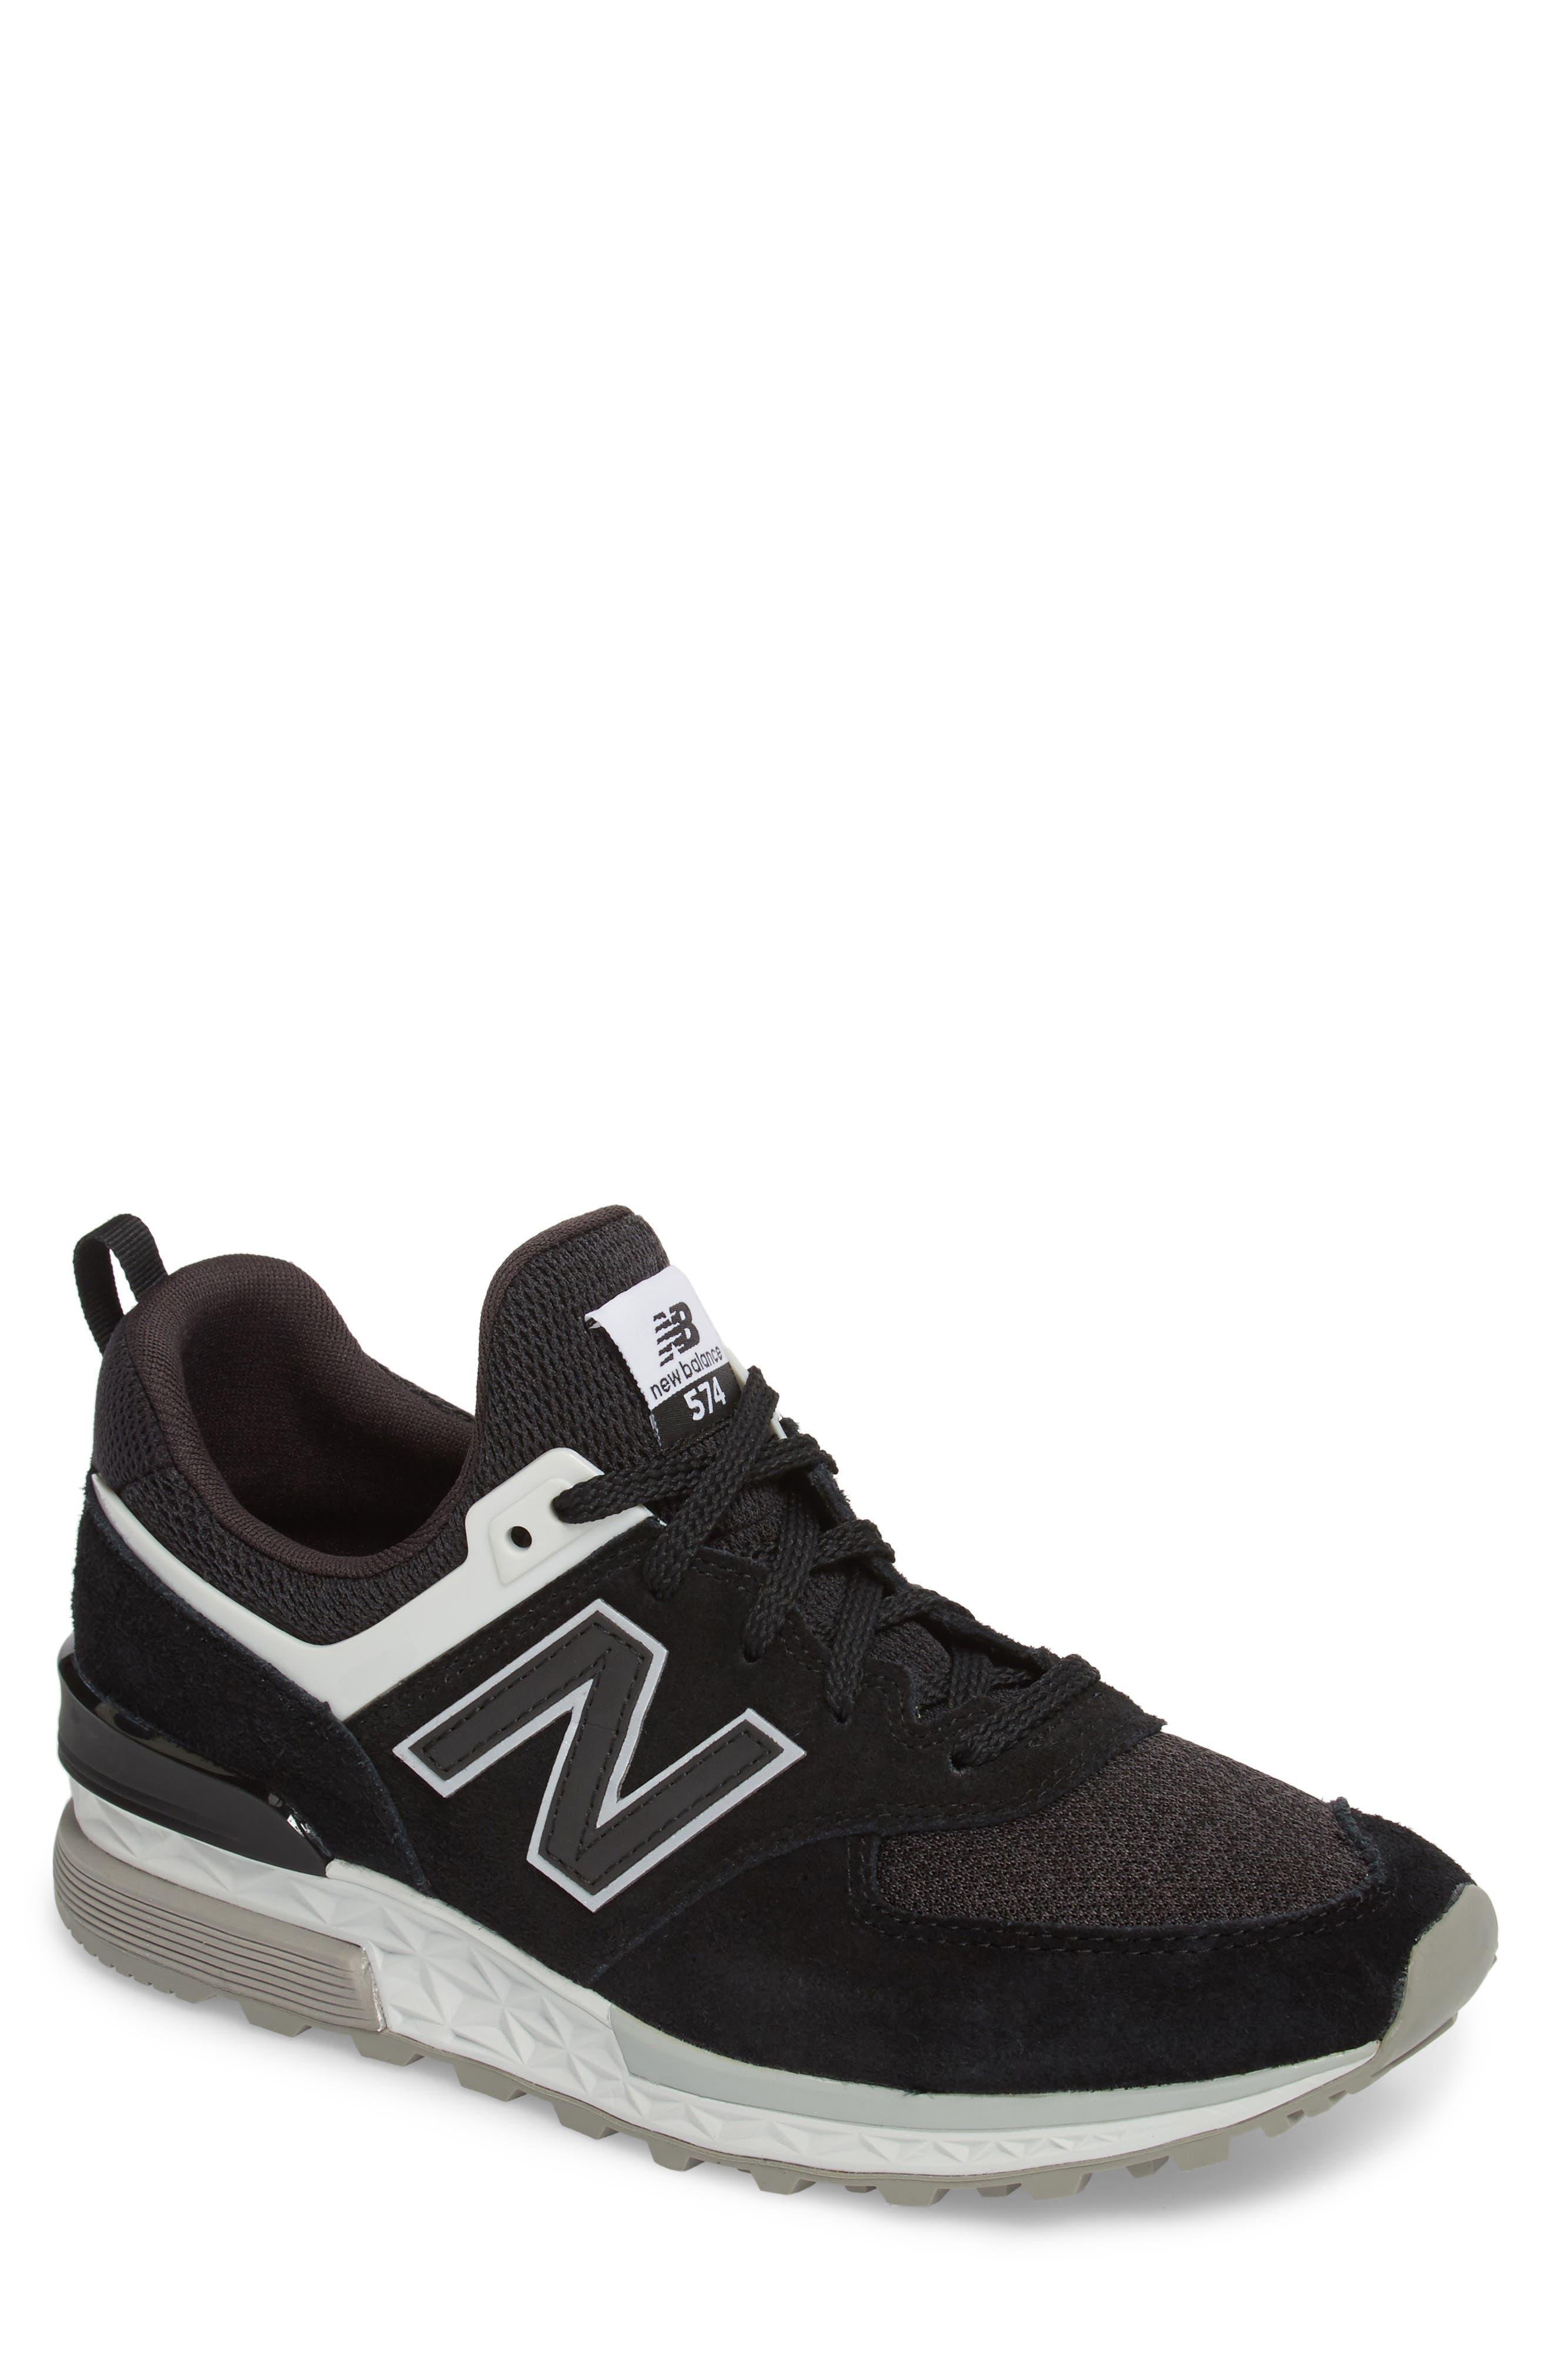 574 Sport Sneaker,                             Main thumbnail 1, color,                             004